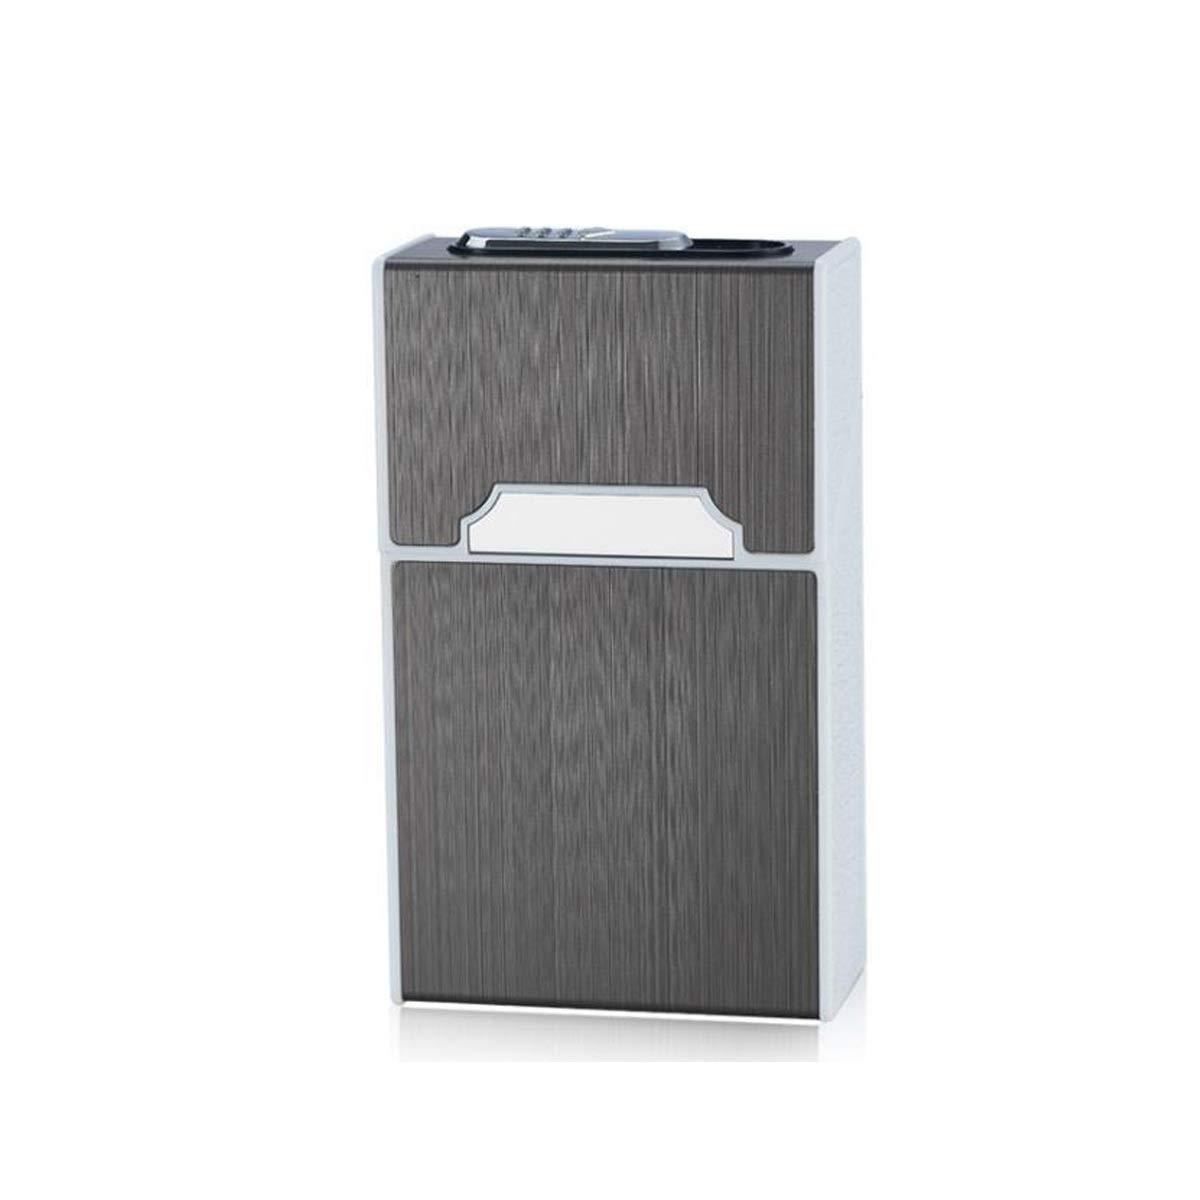 ZHONGYUE Men's Aluminum Alloy Plastic Slender Cigarette Case, USB Charging, Cigarette Box, Gold, Black, White, Send Father Birthday Gift Unique Design, Sturdy and Lightweight. (Color : Black)